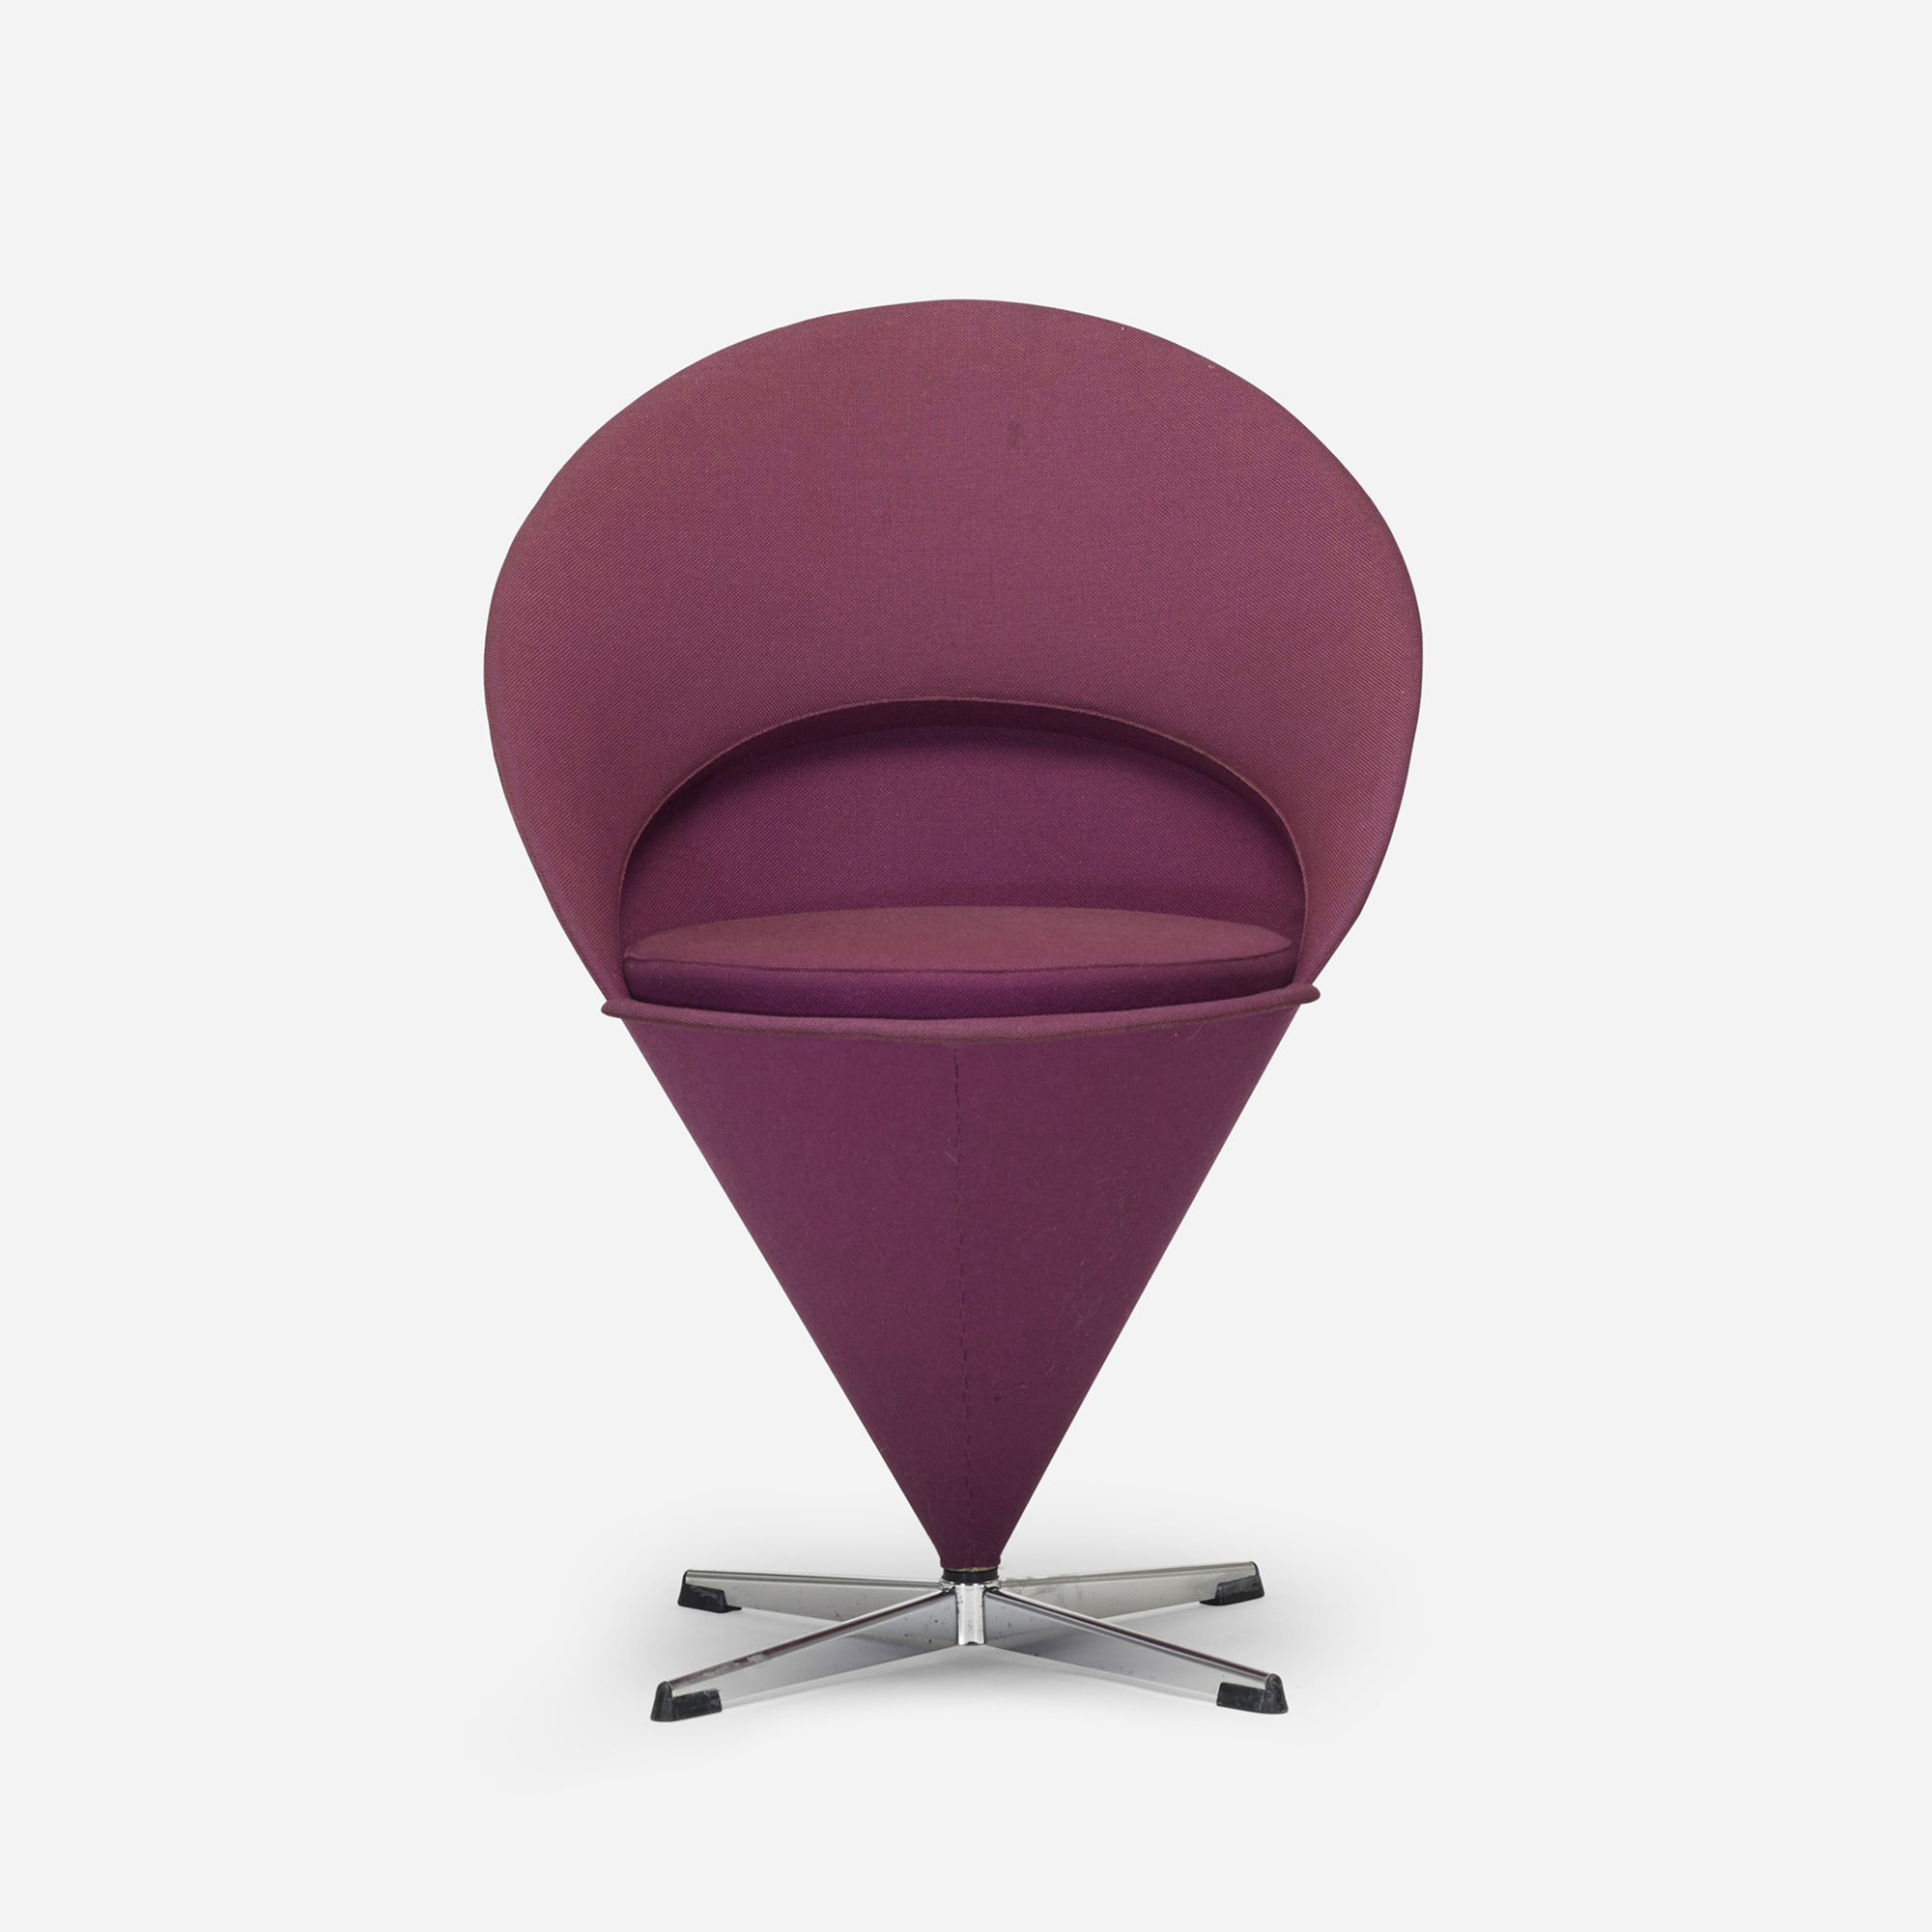 648: Verner Panton / Cone chair (1 of 4)